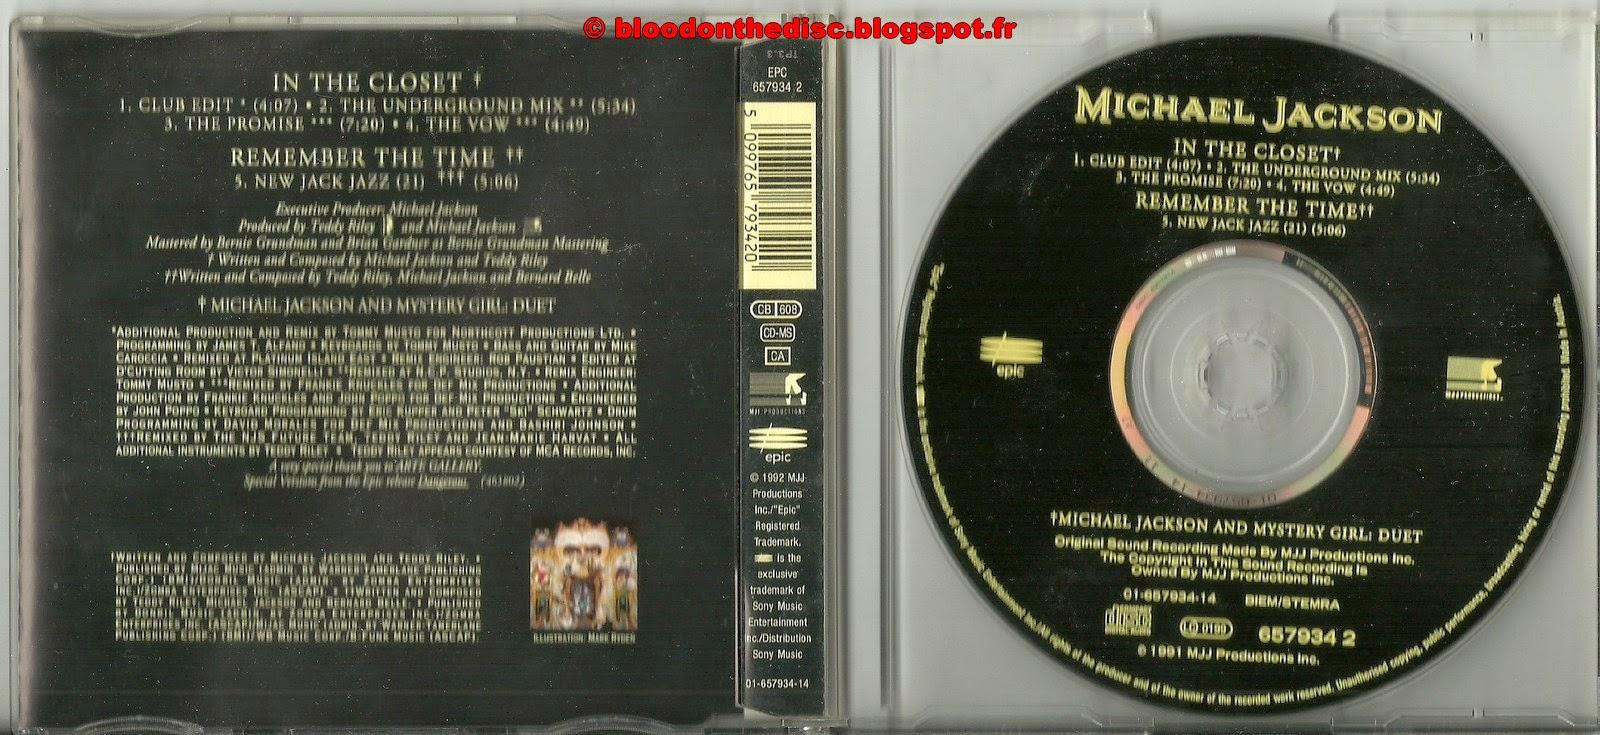 In The Closet Maxi CD Single